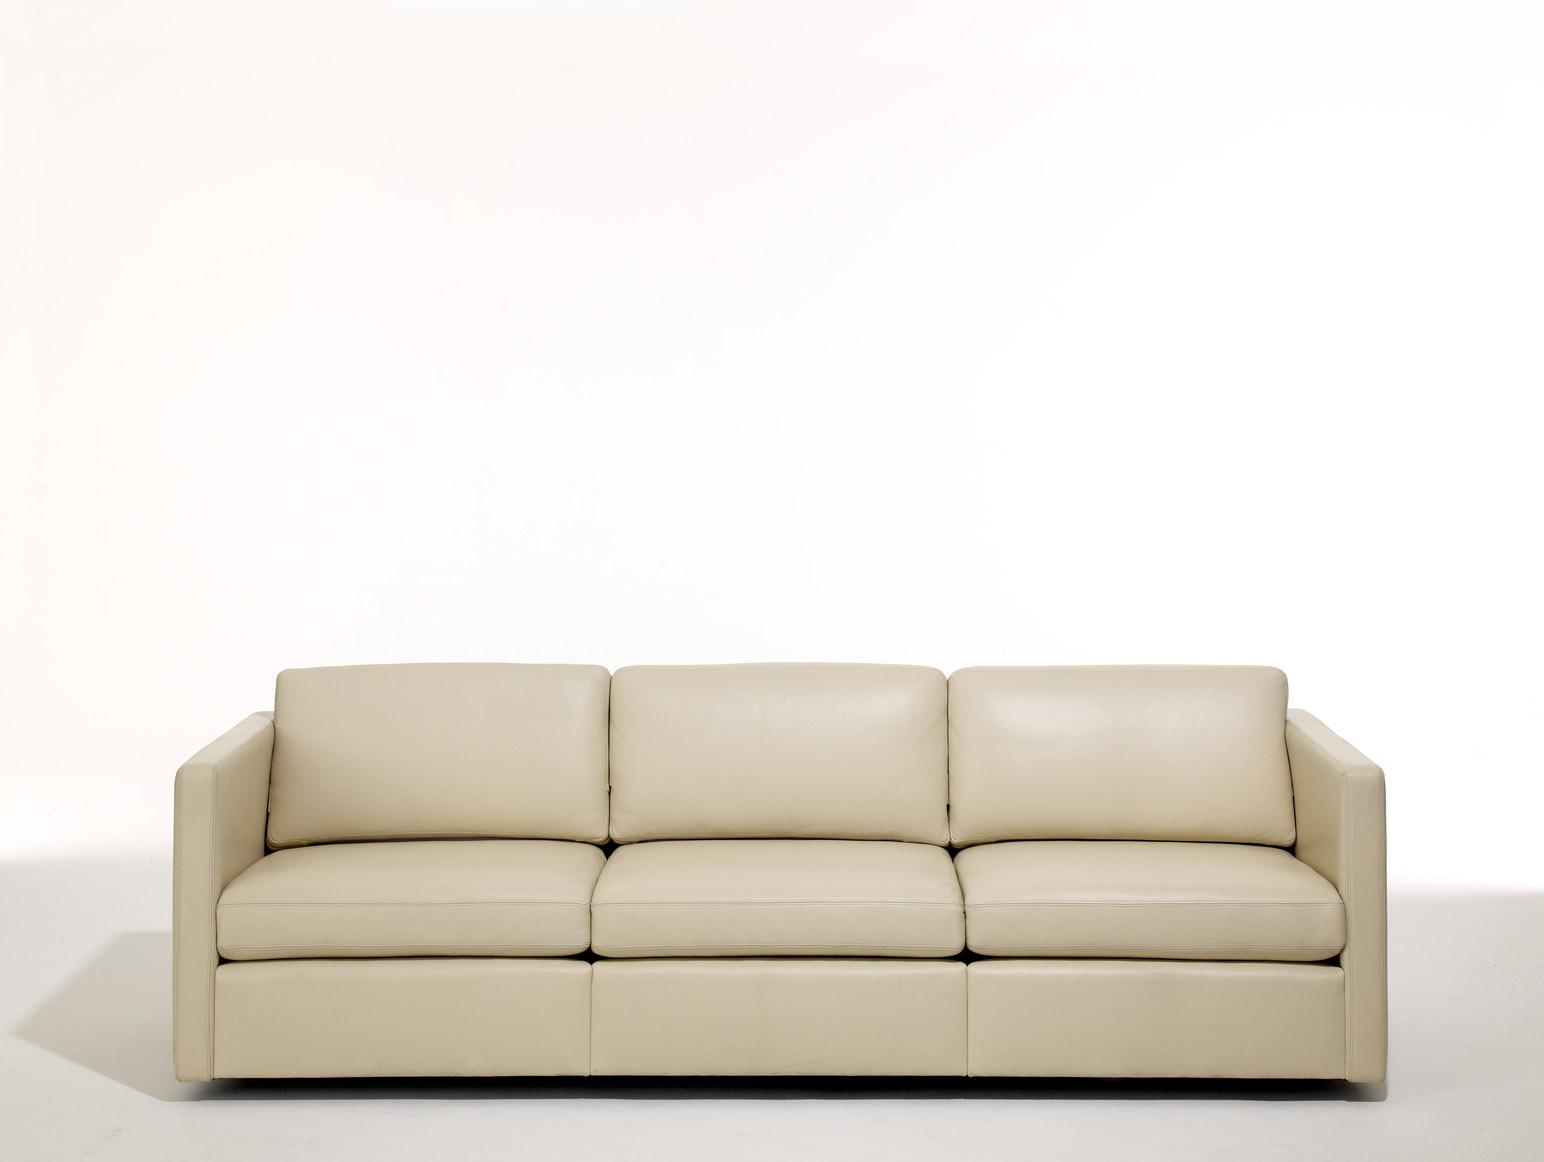 barcelona sectional sofa ottoman small bed double pfister and knoll